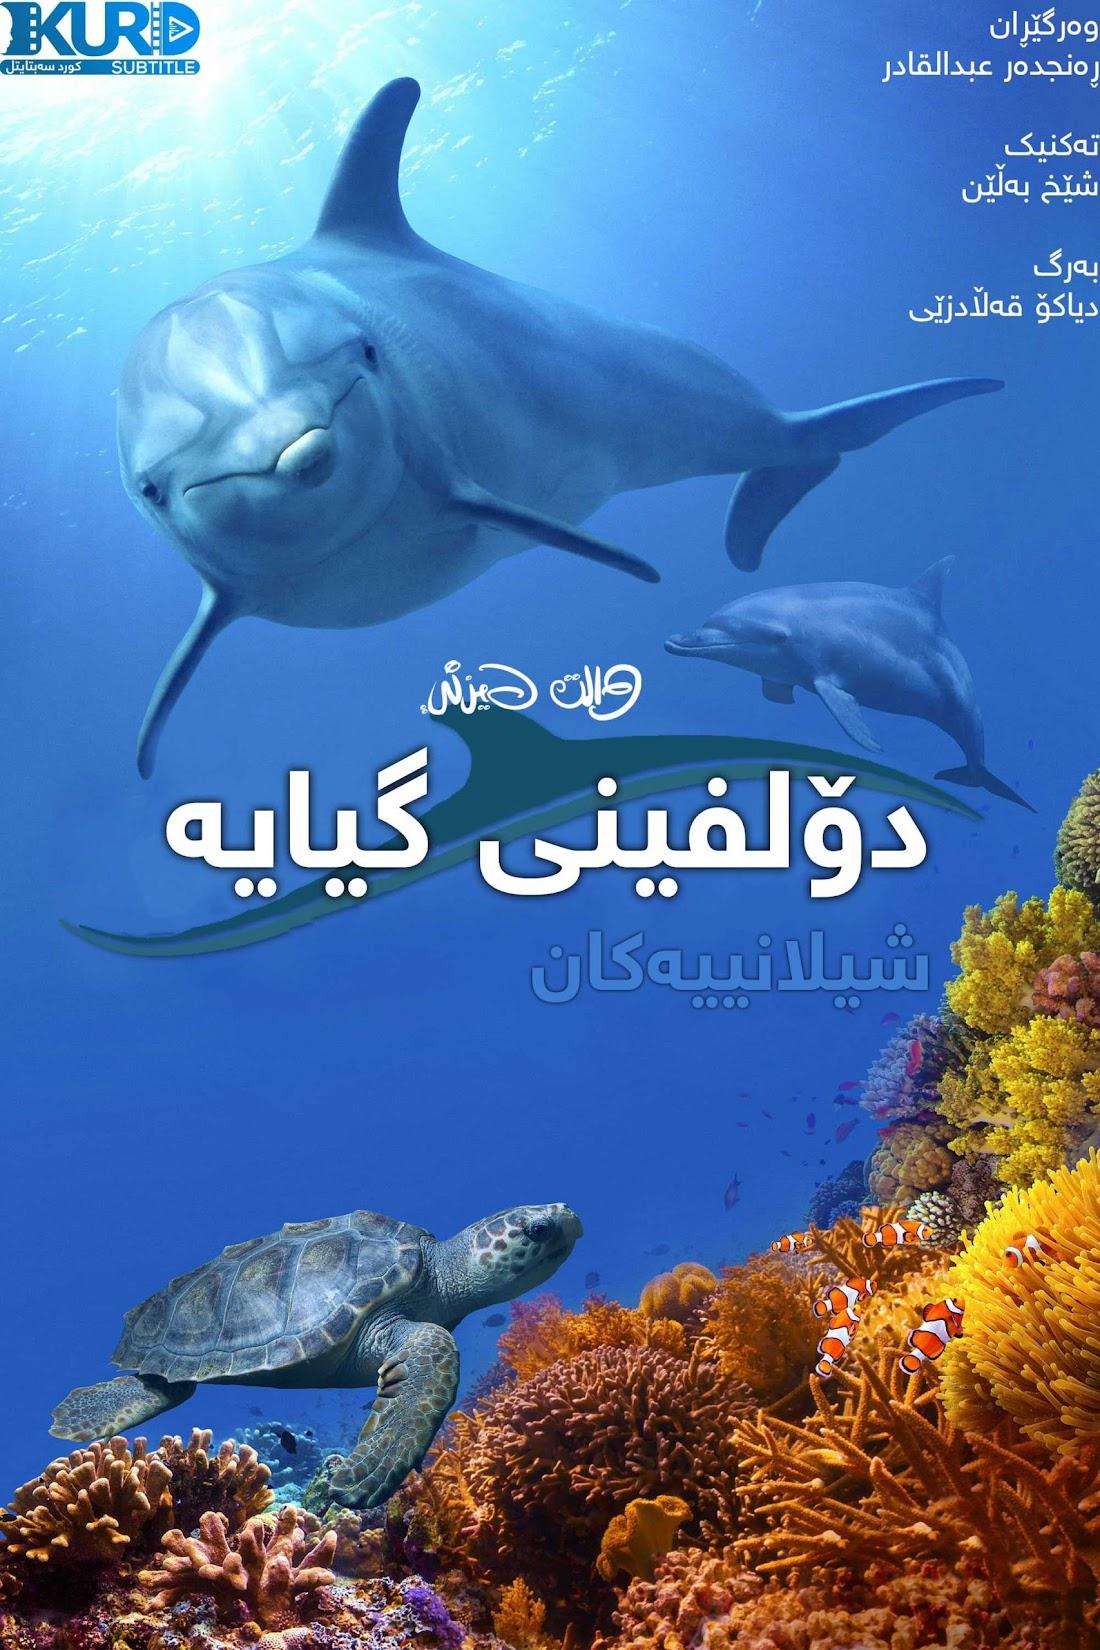 Dolphin Reef kurdish poster